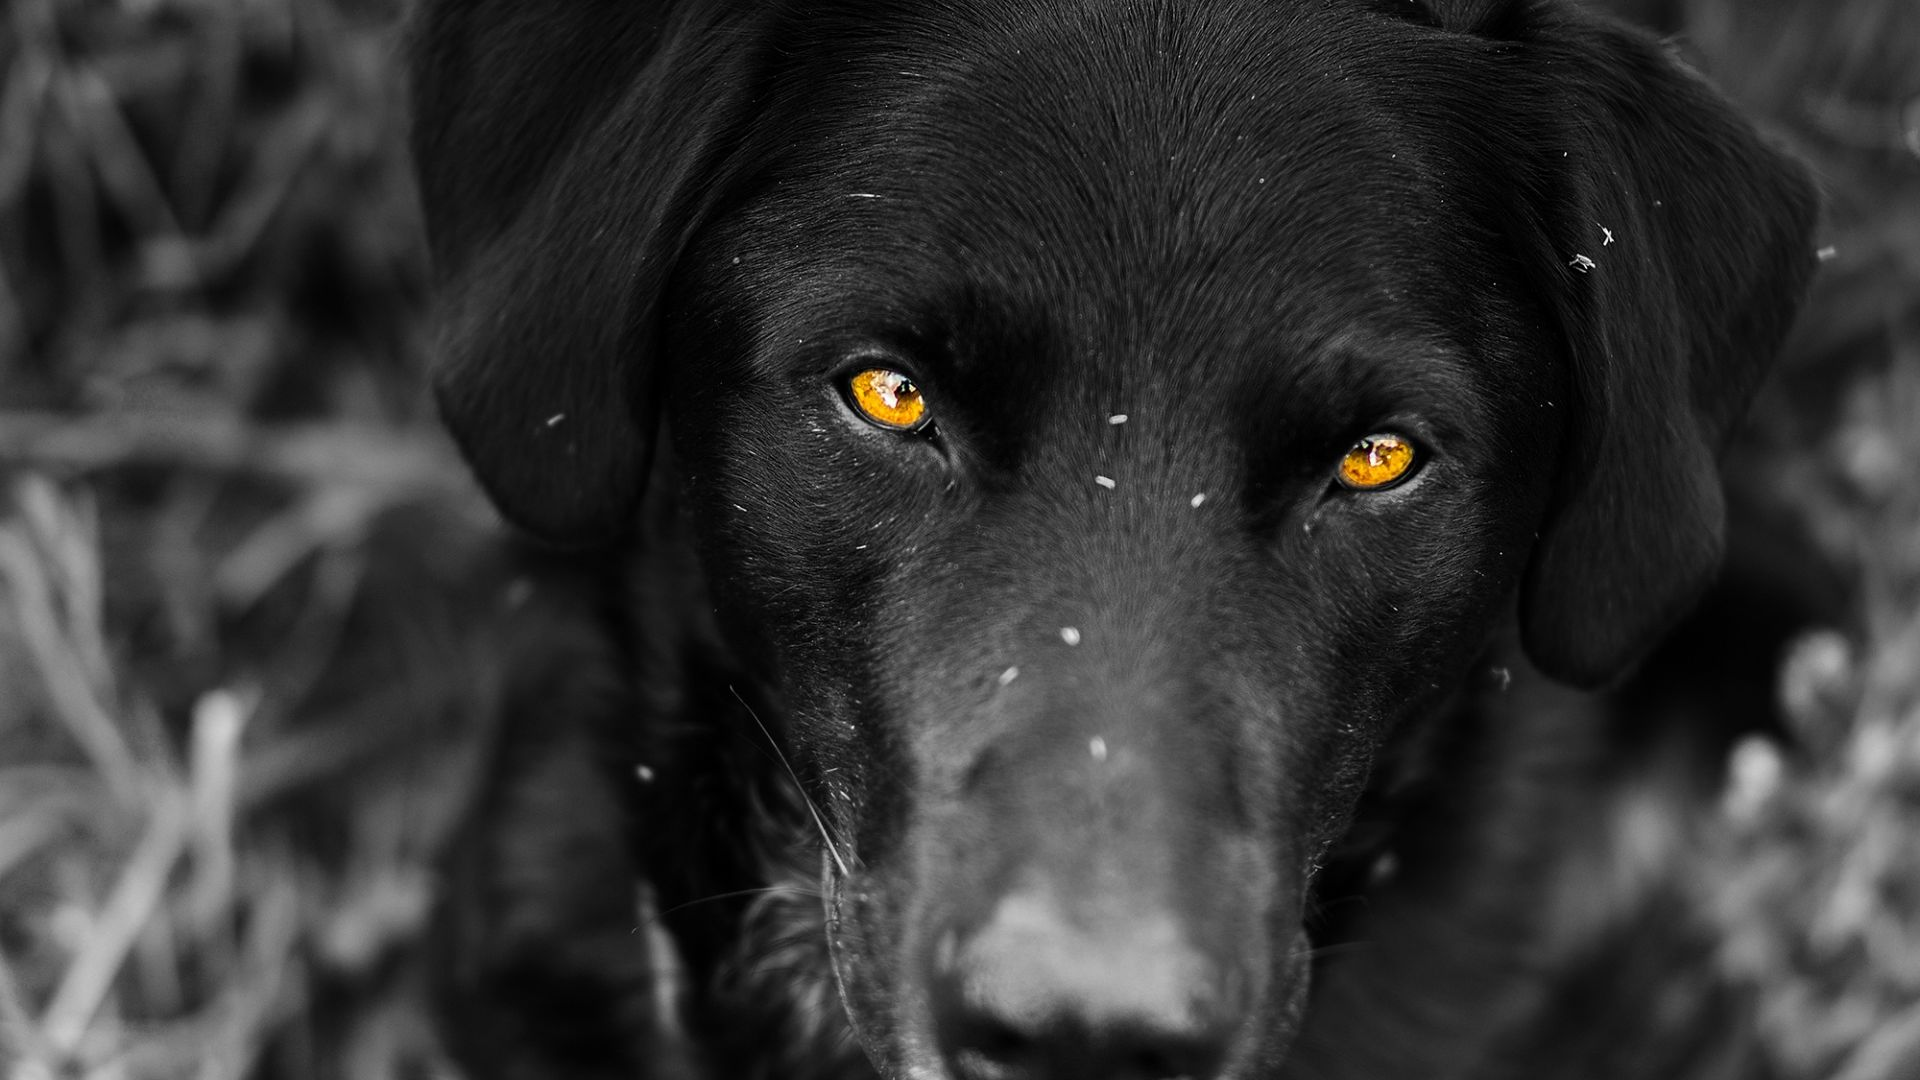 desktop wallpaper black labrador dog muzzle yellow eyes